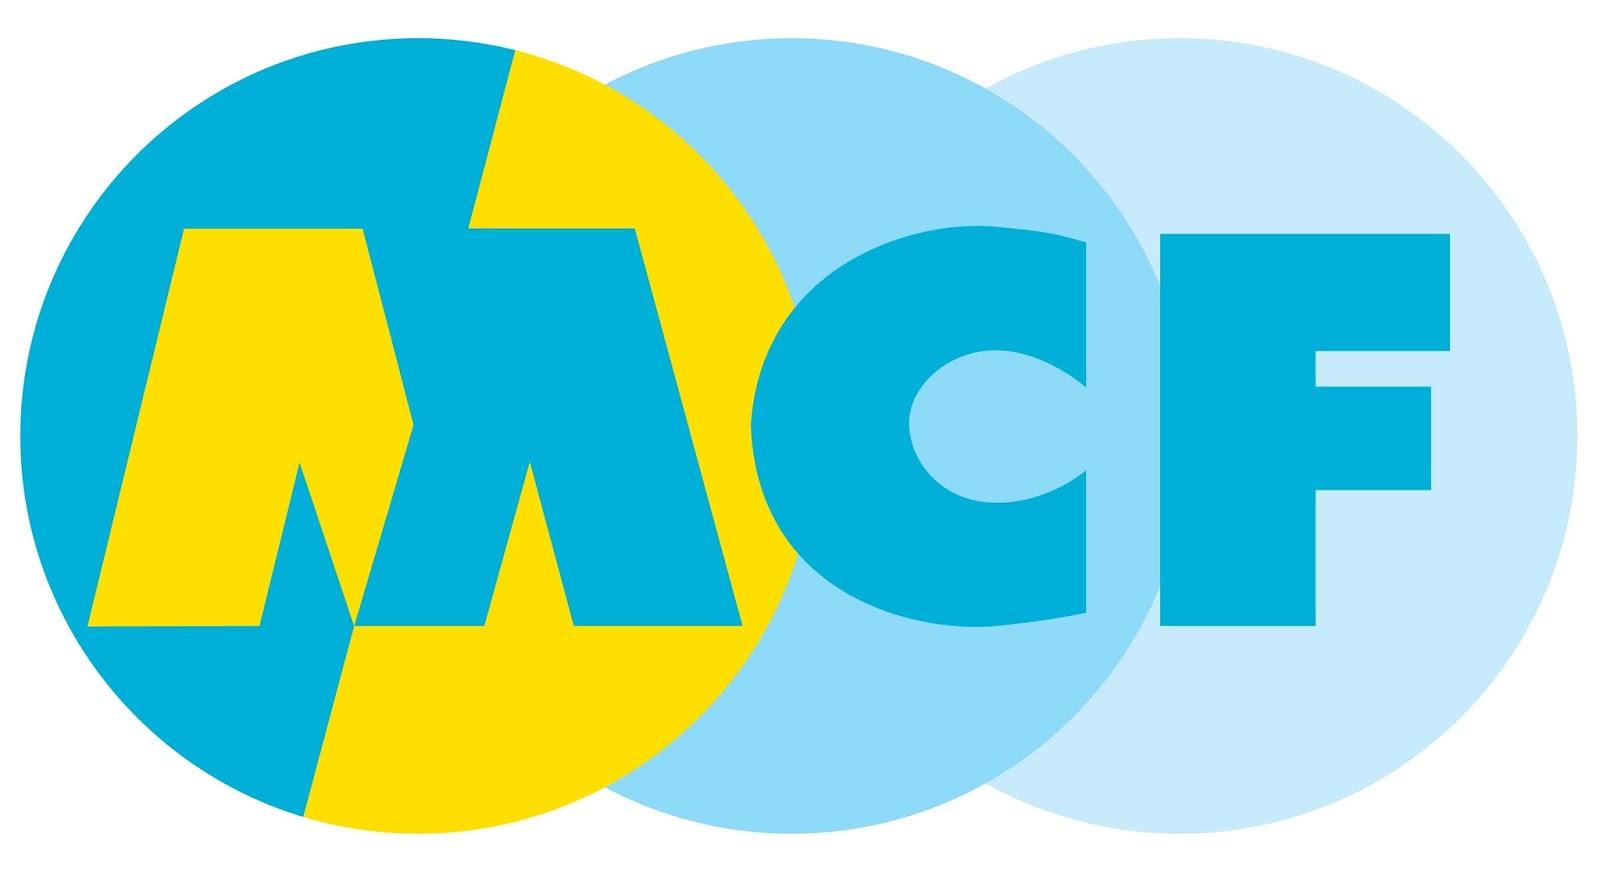 MEGA AUTO CENTRAL FINANCE (MACF)